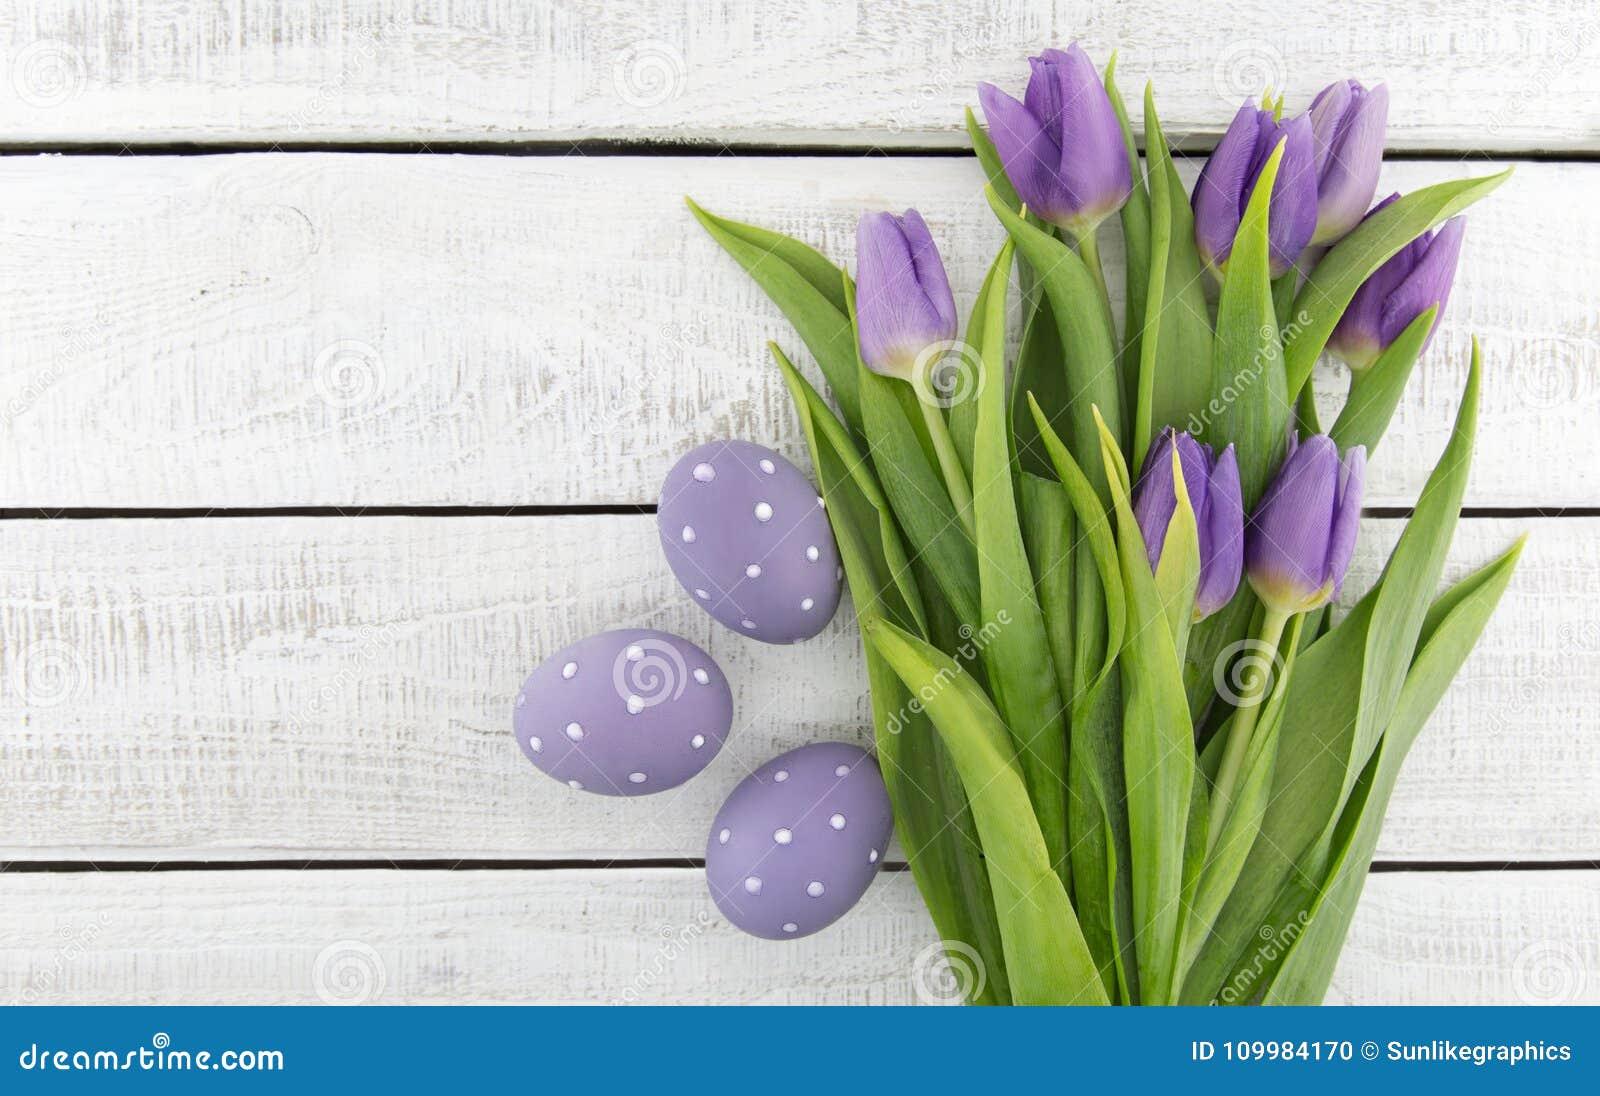 Purpleviolet郁金香和被绘的复活节彩蛋花束在丝毫